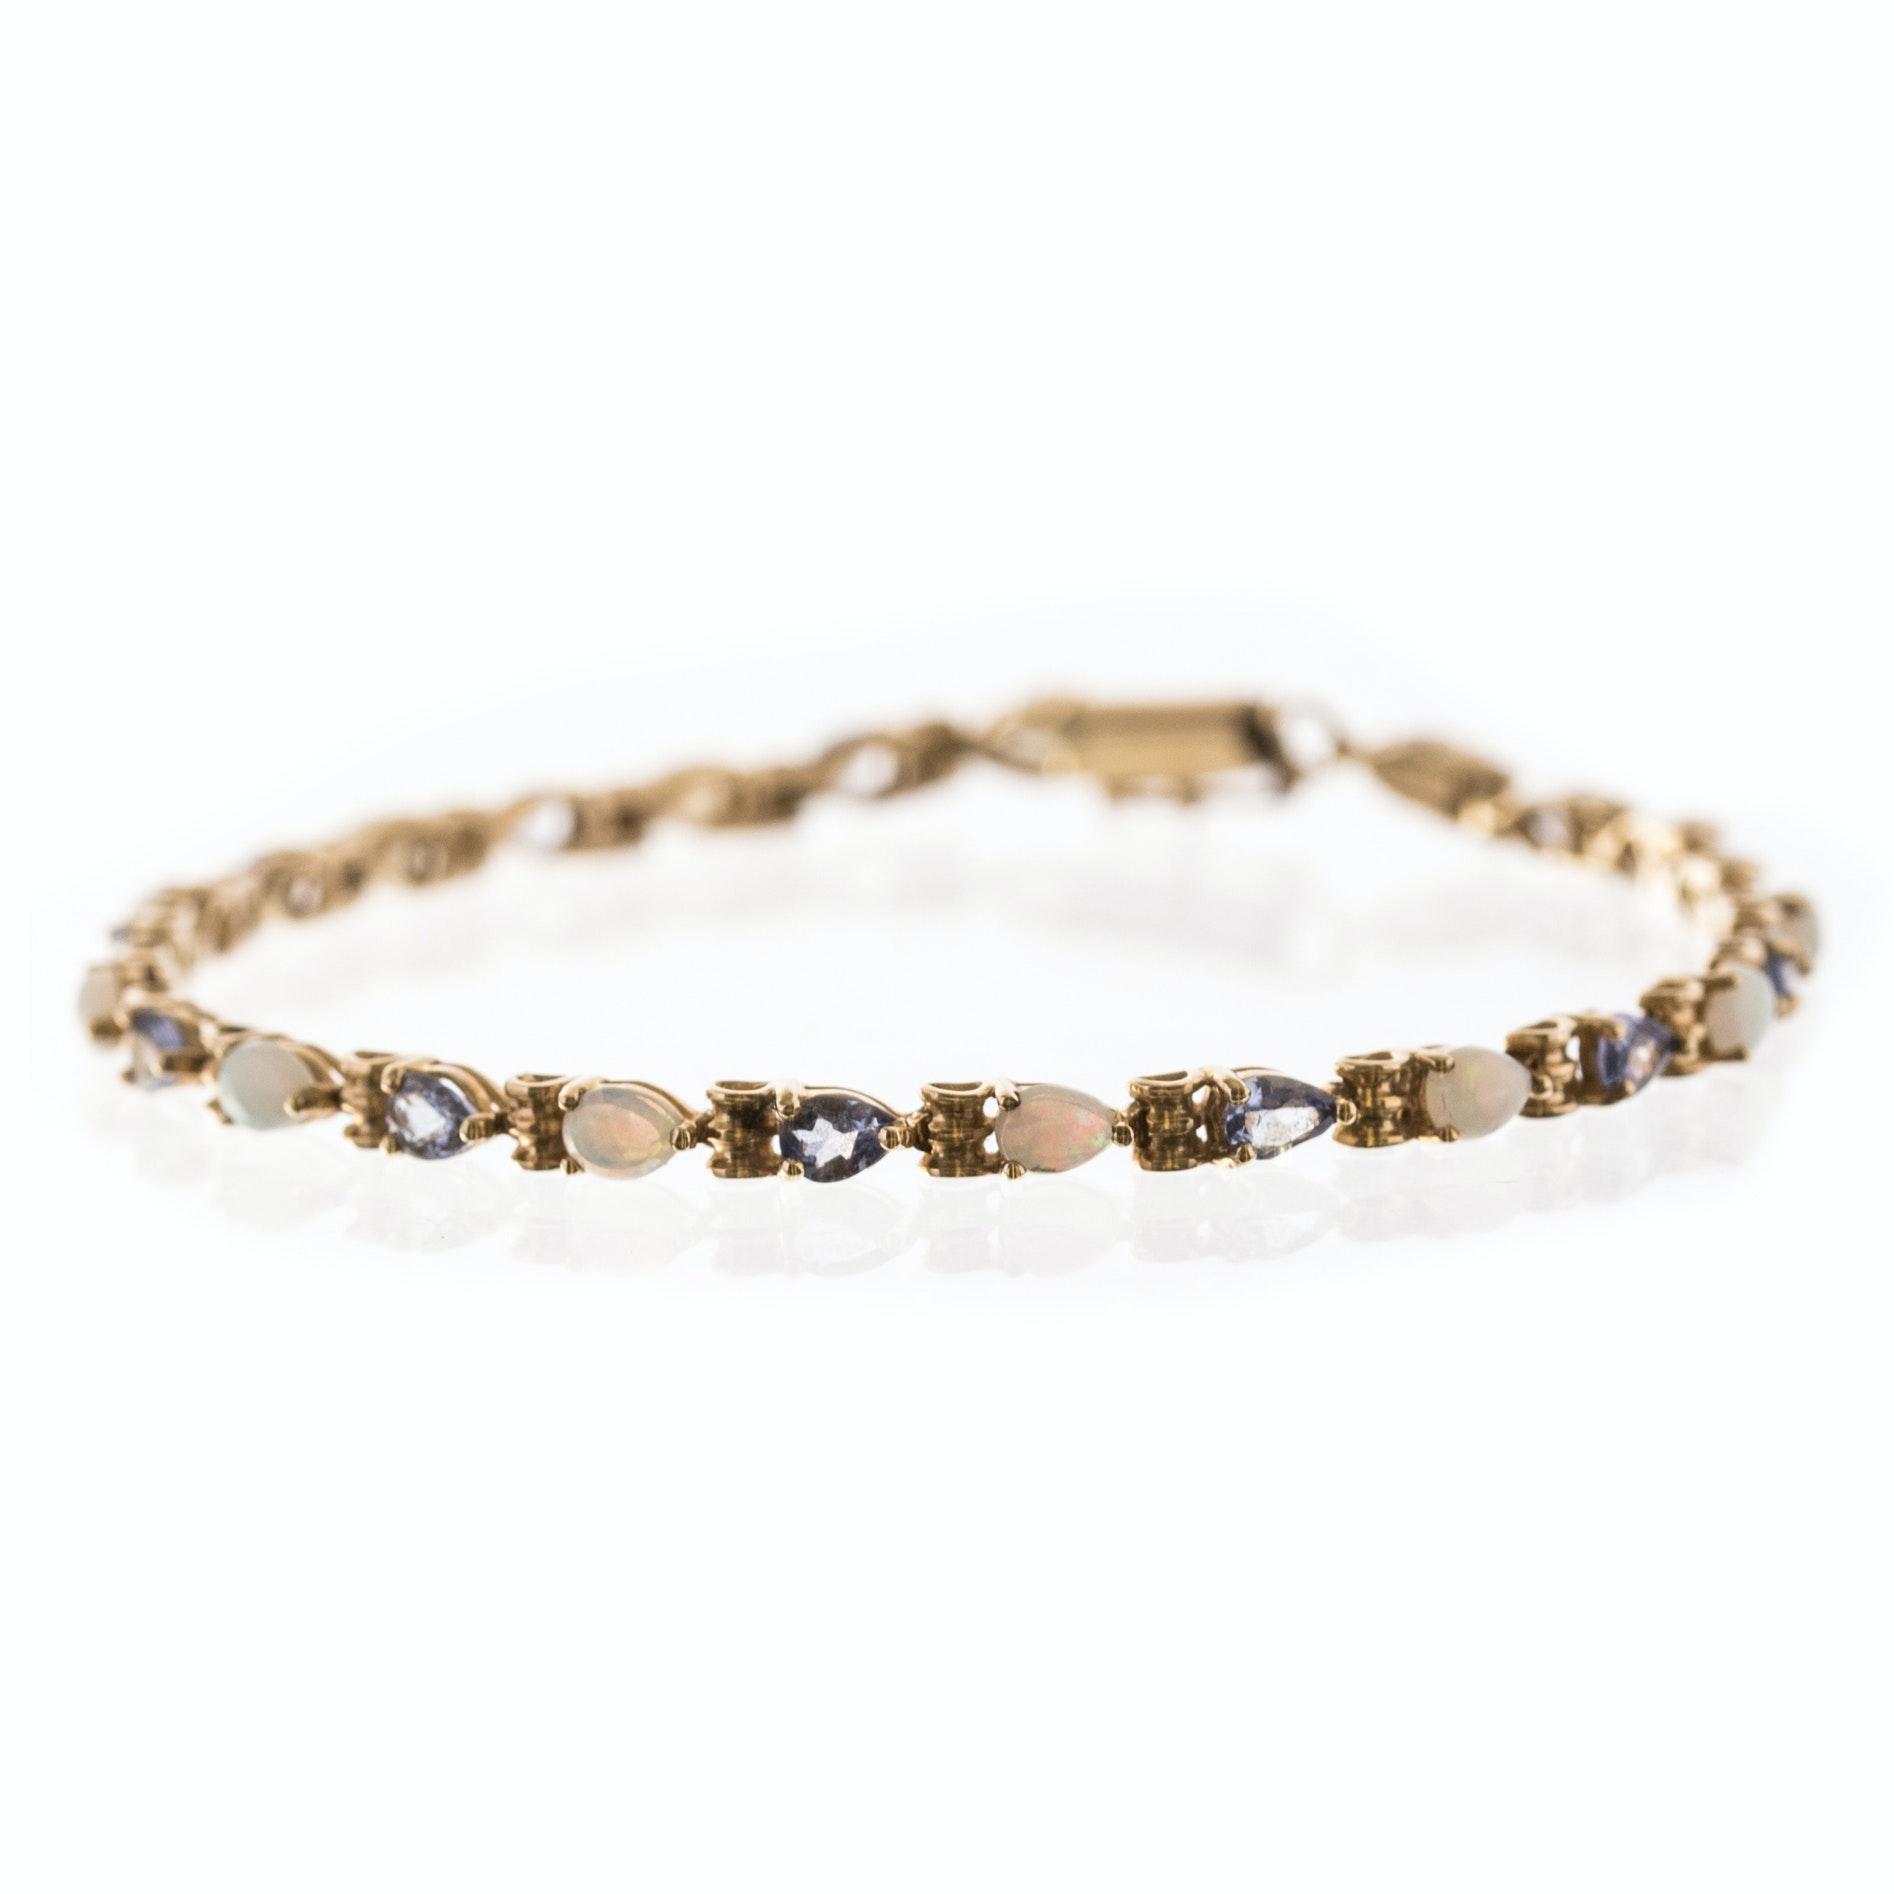 10K Yellow Gold 1.00 CTW Opal and 1.26 CTW Tanzanite Bracelet